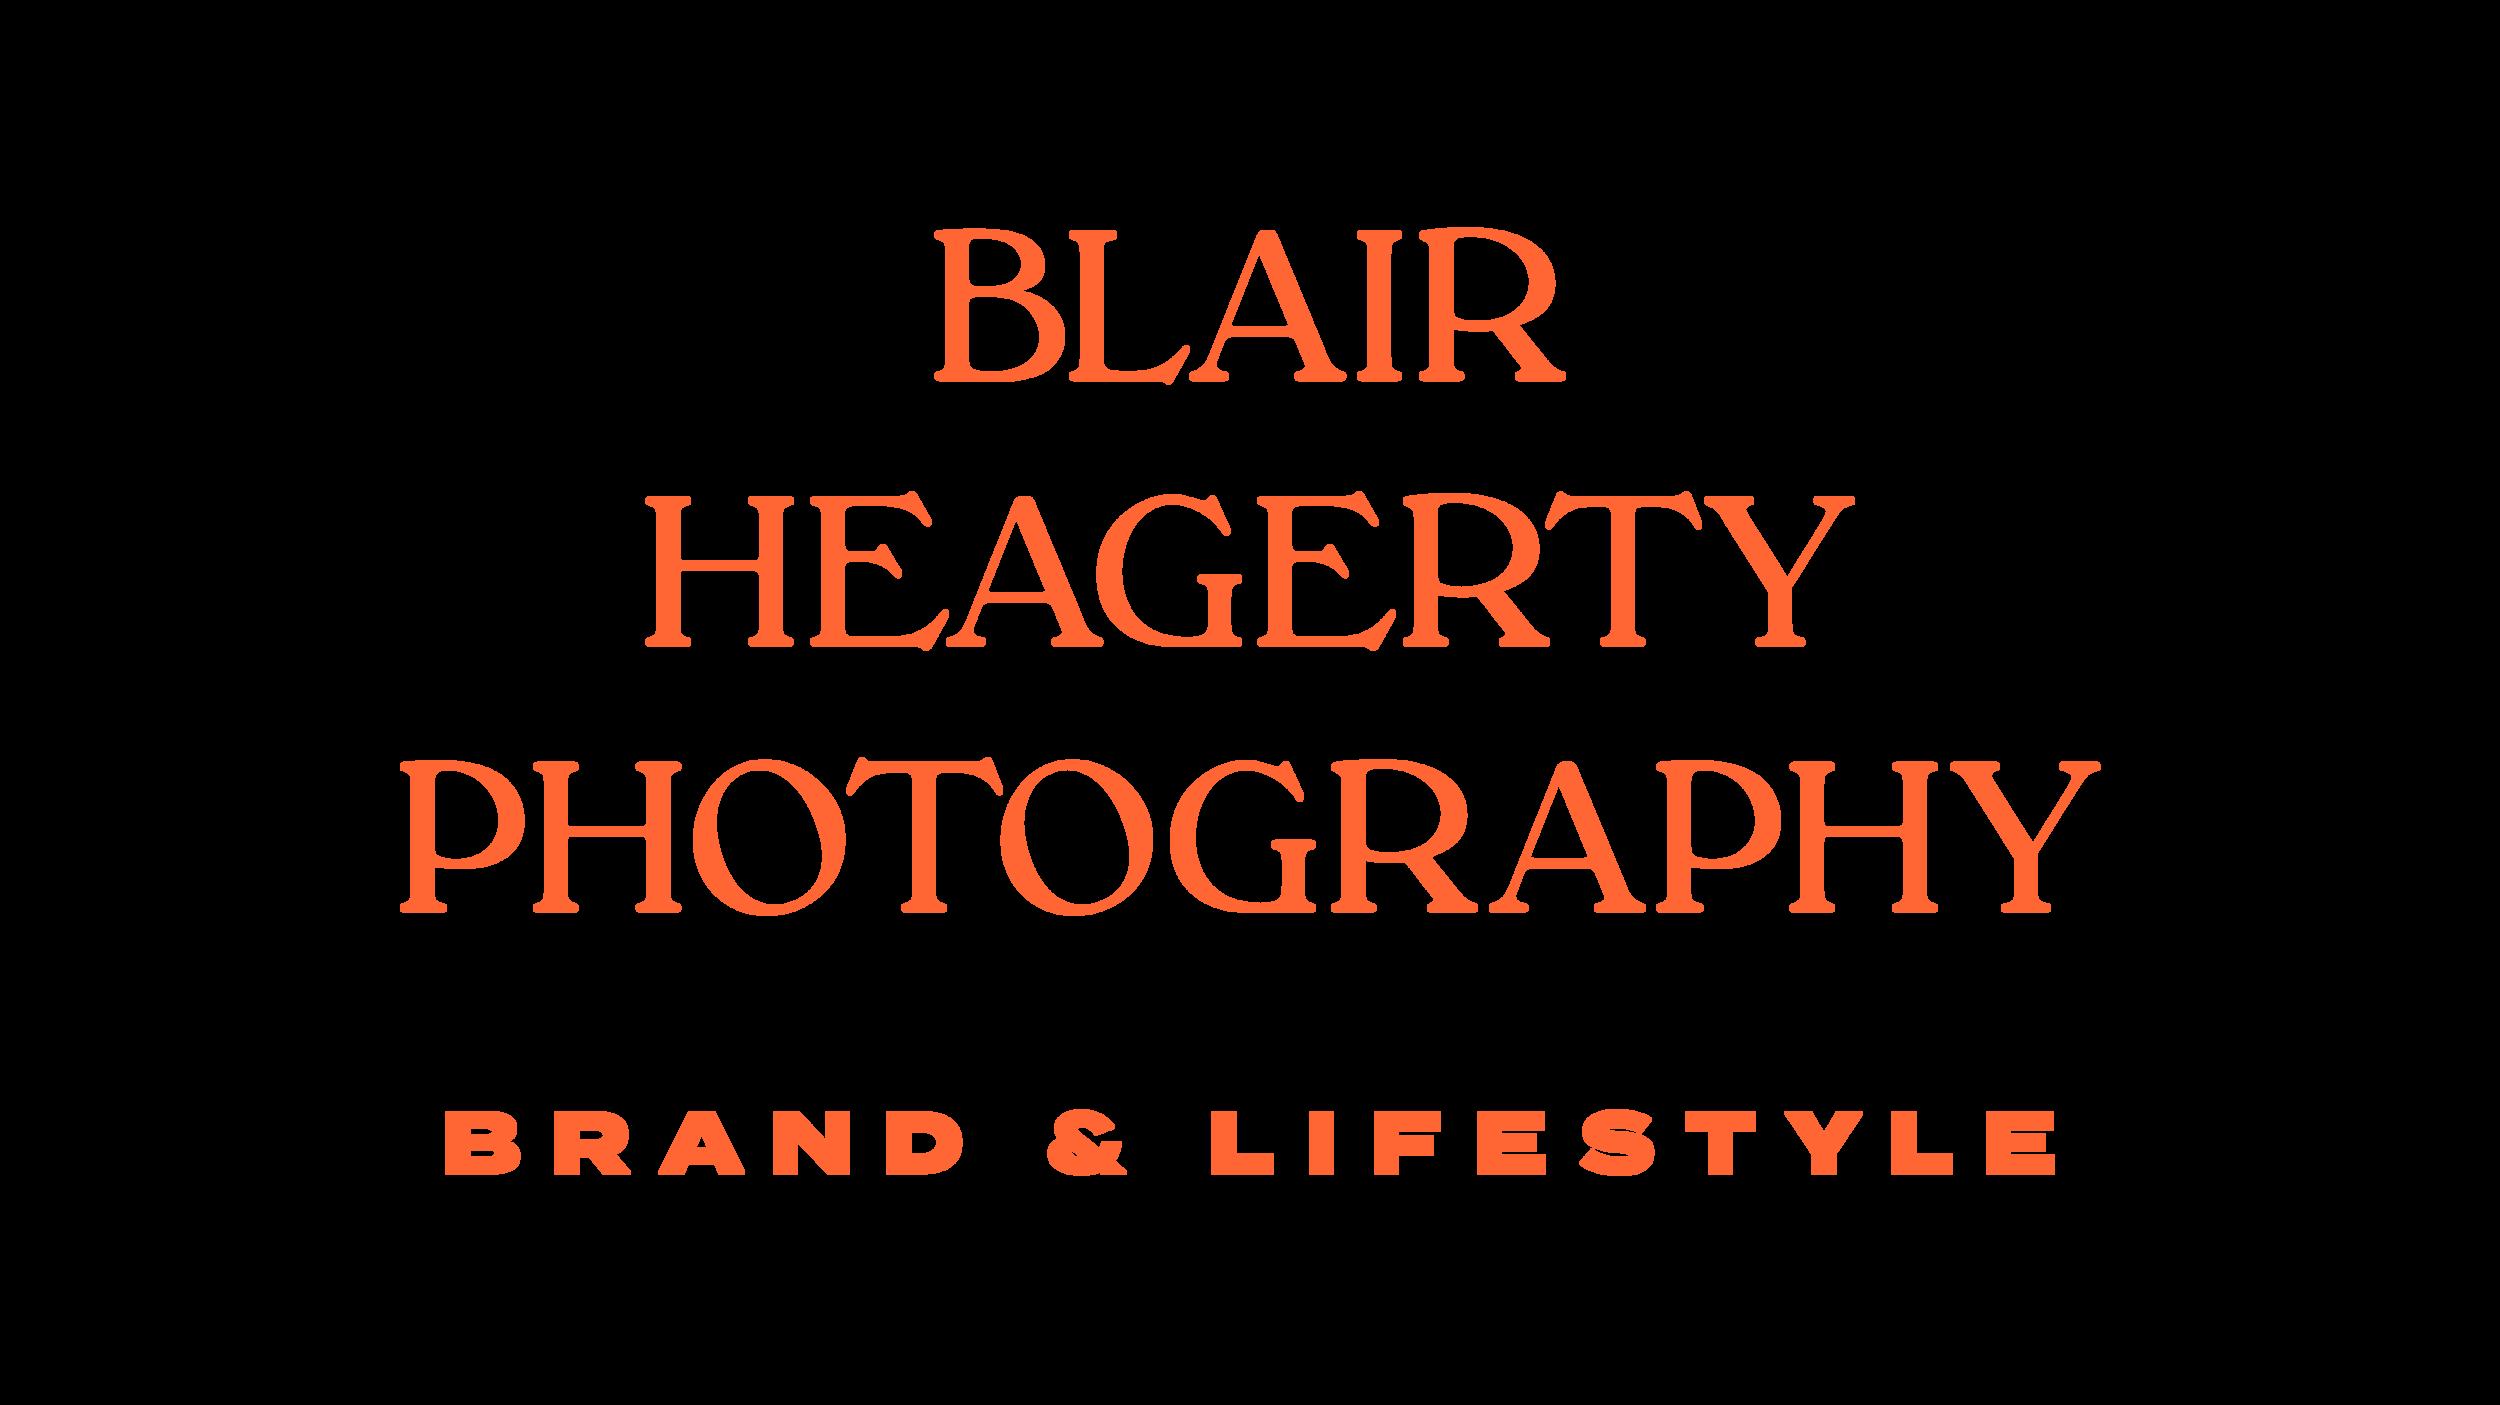 blairHeagertyPhotography_logos_SPLASH-01.png